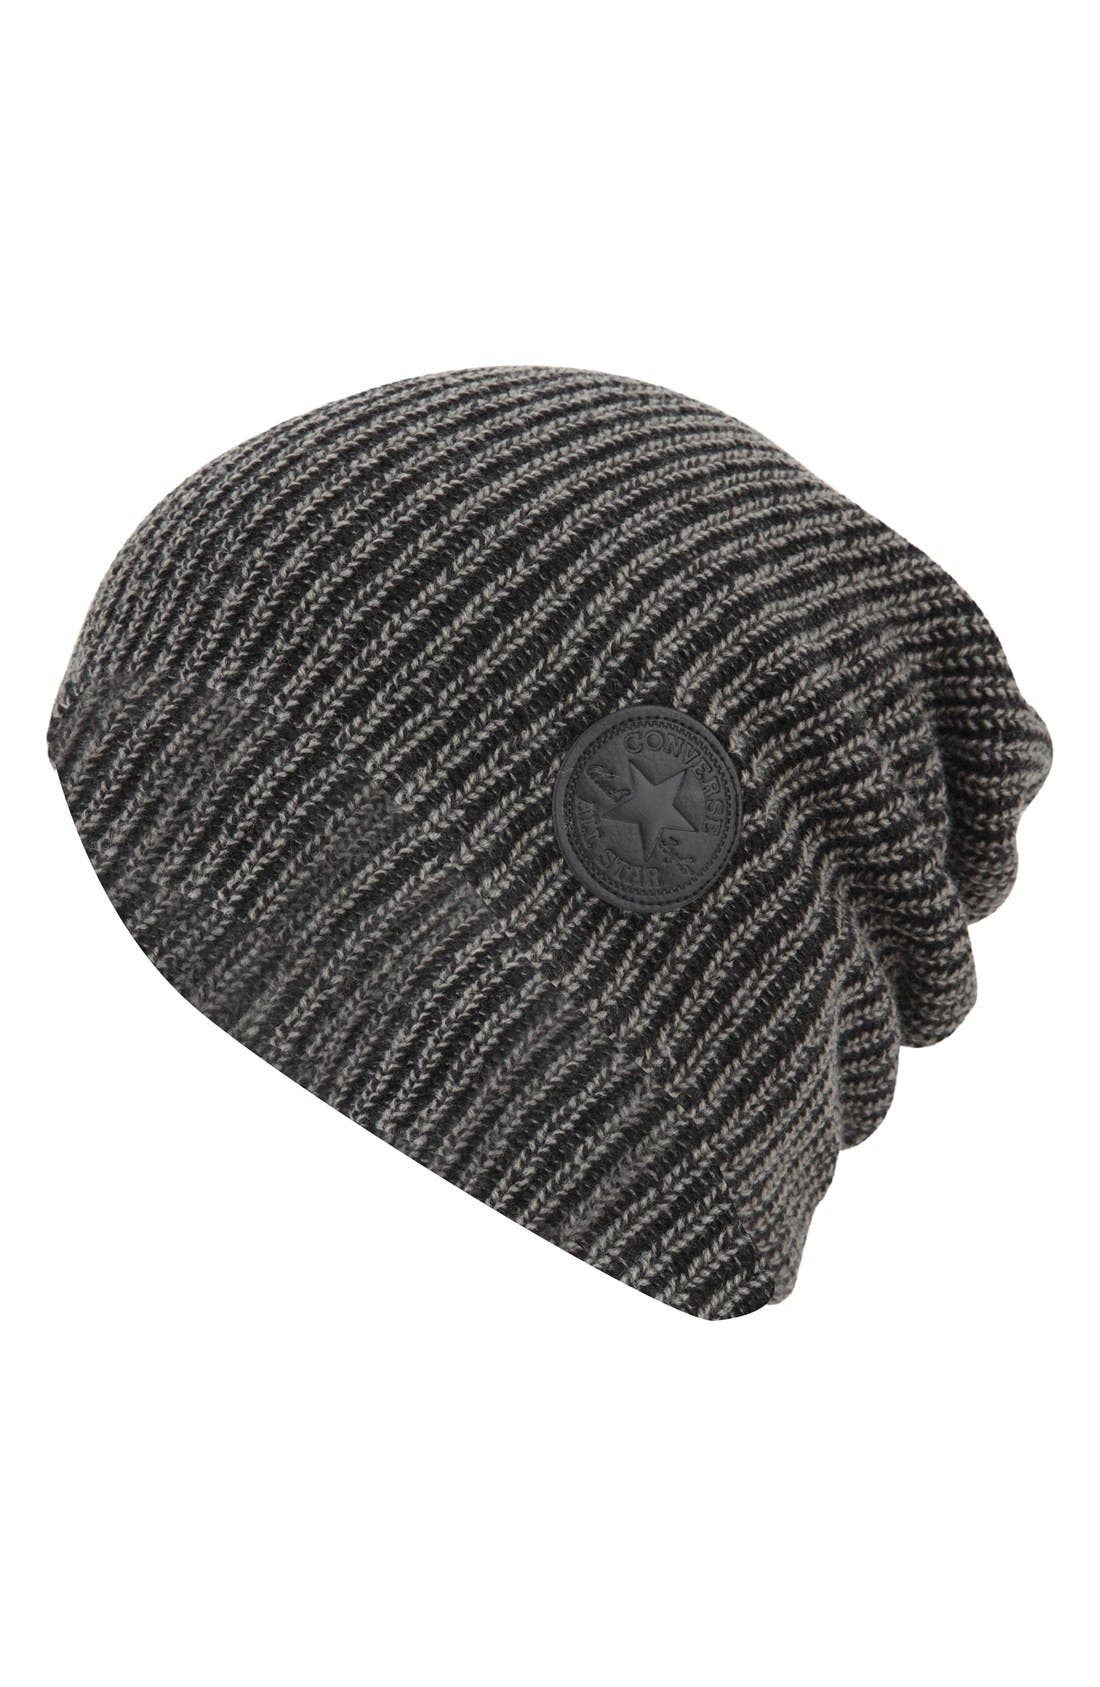 CONVERSE 'Winter Slouch' Knit Cap, Main, color, 001